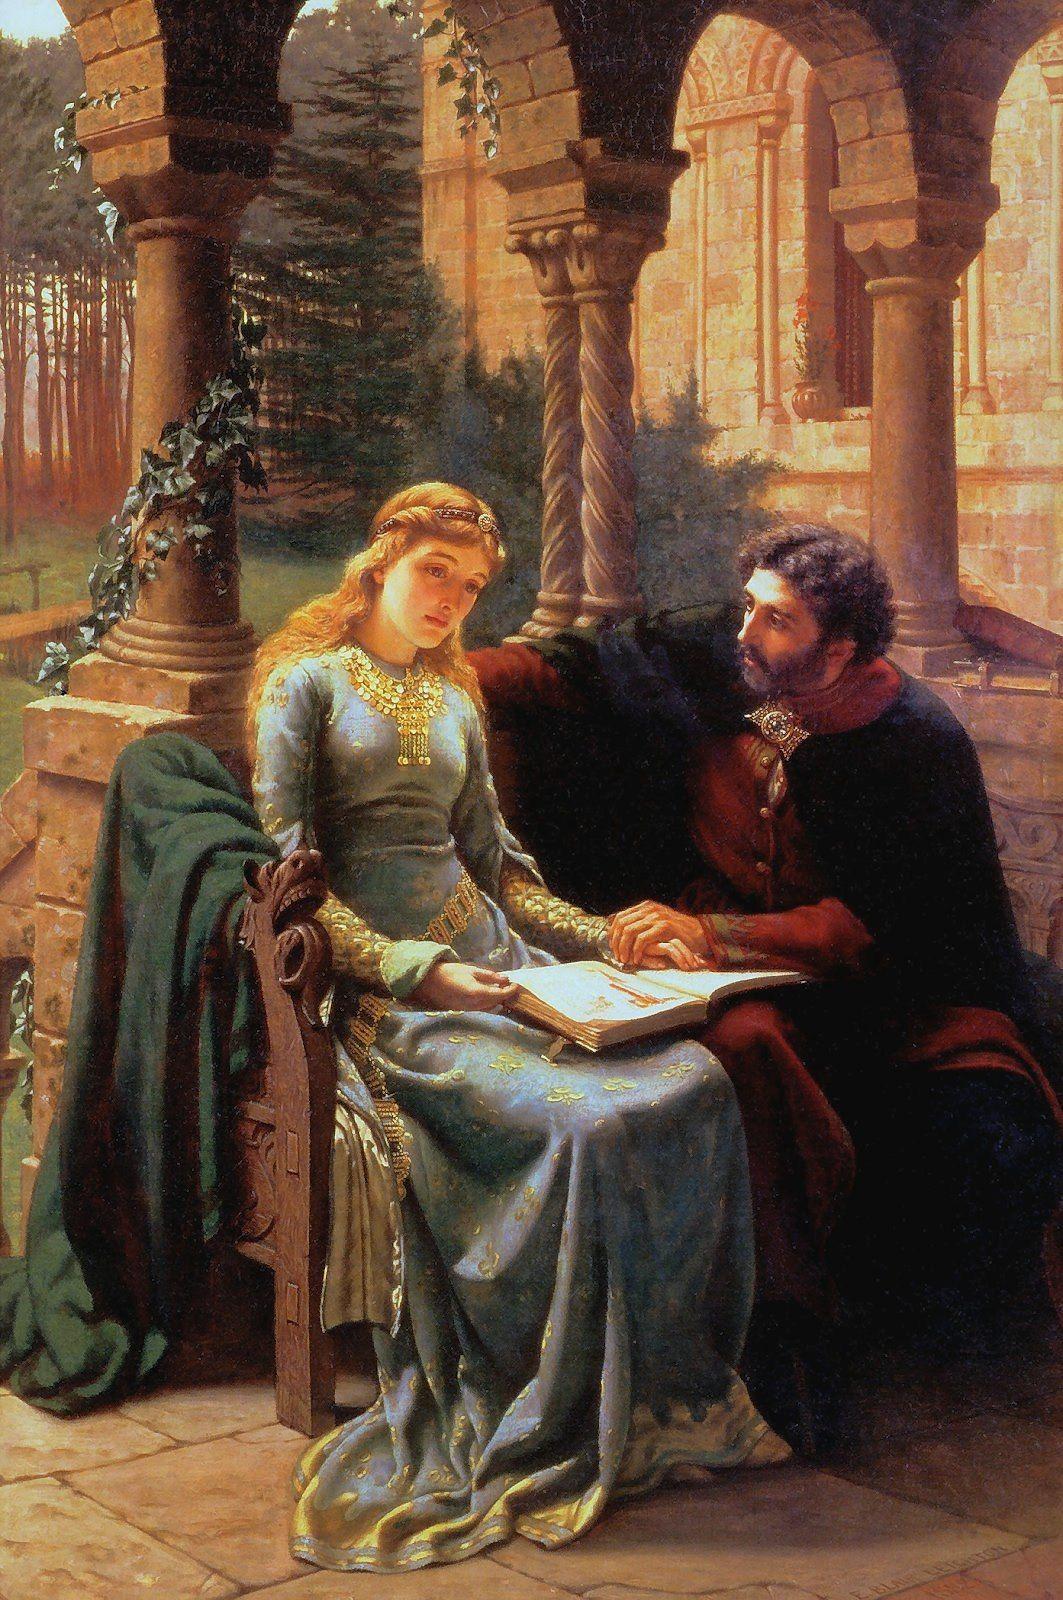 Leighton Edmund Blair Abelard And His Pupil Heloise Historical Painting Famous Art Romantic Art